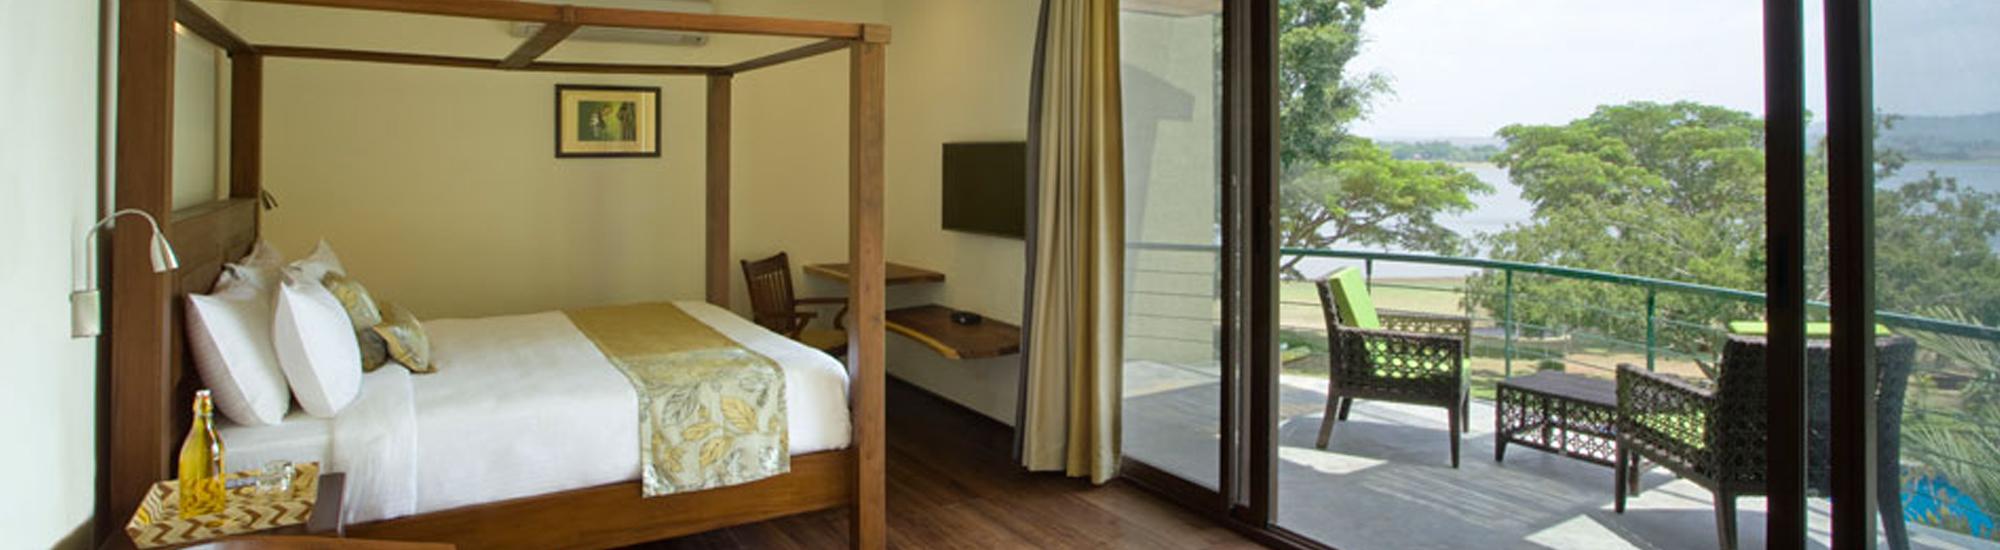 holiday-destinations-around-bangalore-jungle-lodges-kabini-king